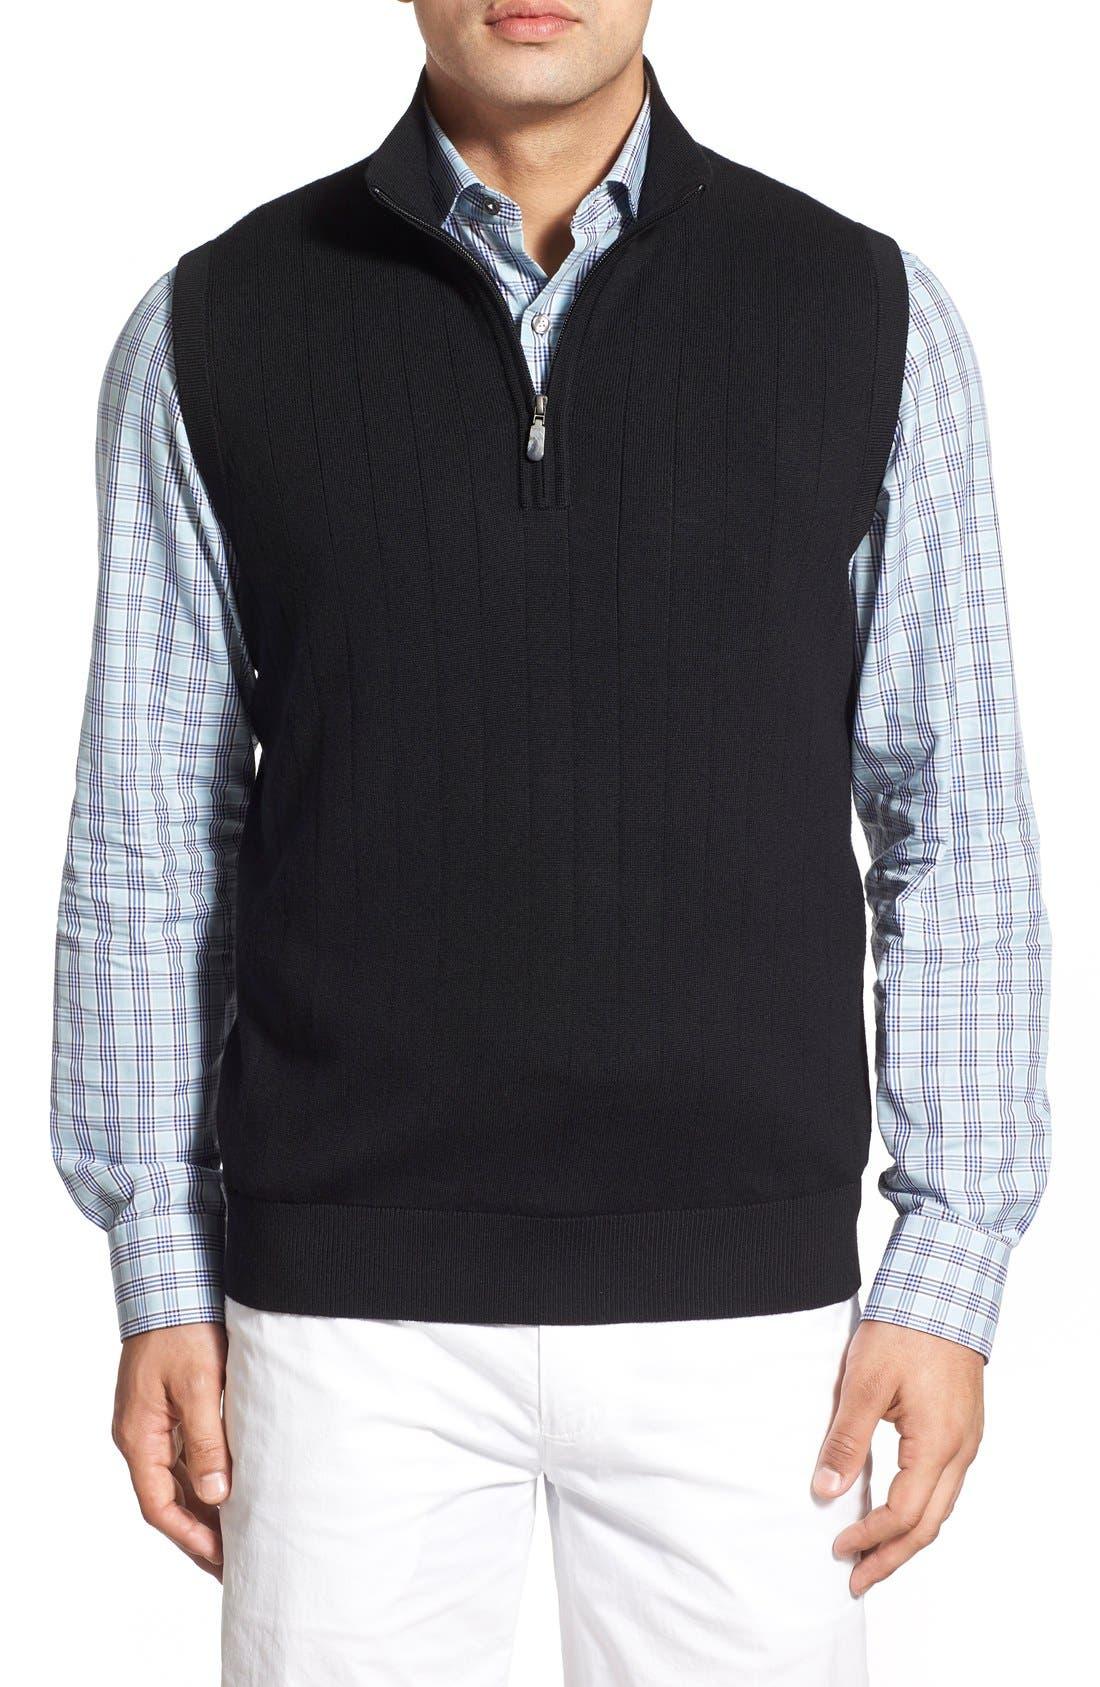 Alternate Image 1 Selected - Bobby Jones Quarter Zip Wool Sweater Vest